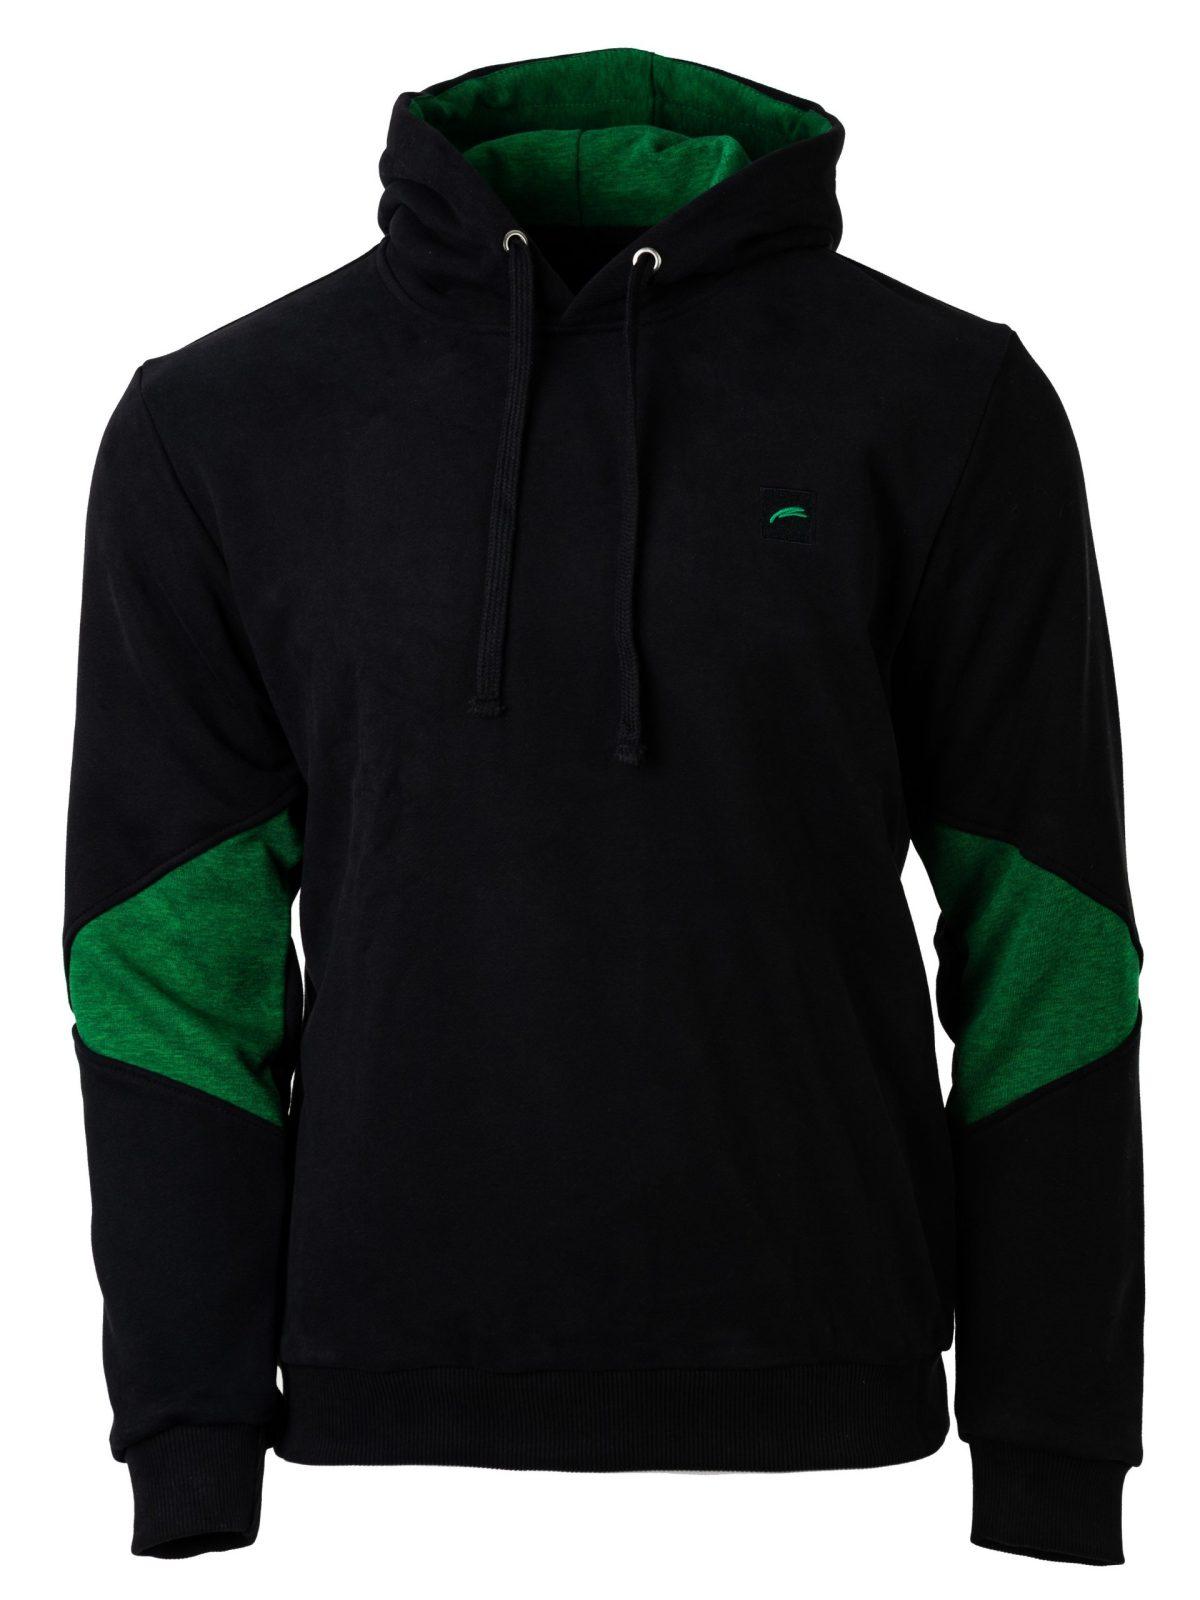 muški duks crno zeleni